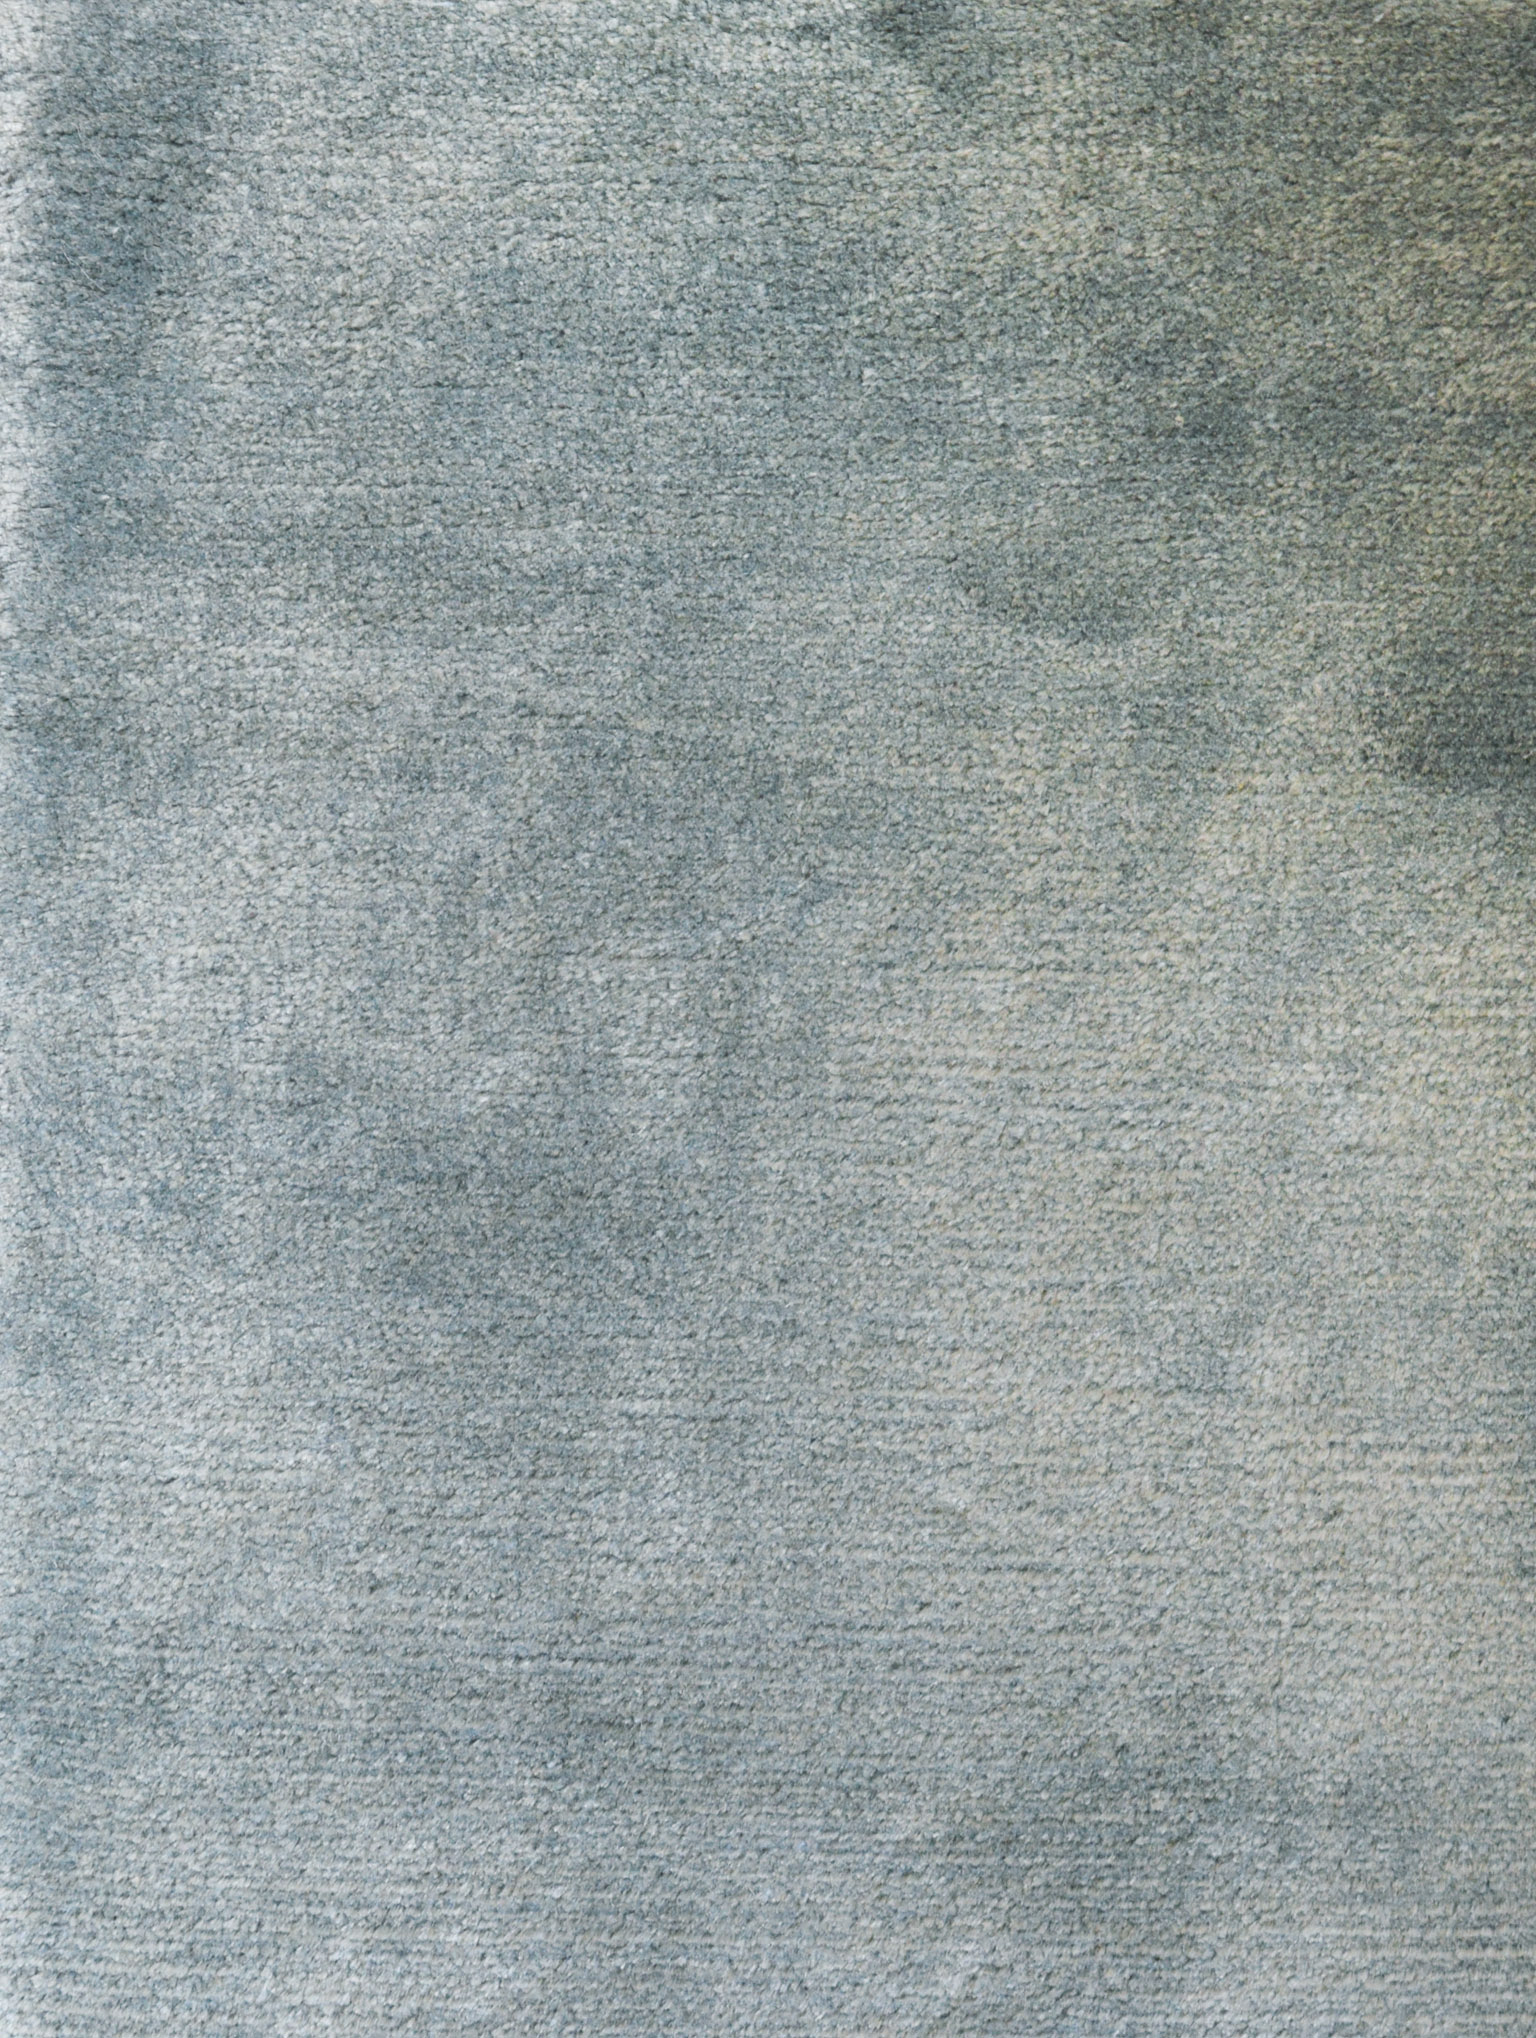 Muga Silk Solid HSPSA16113/311